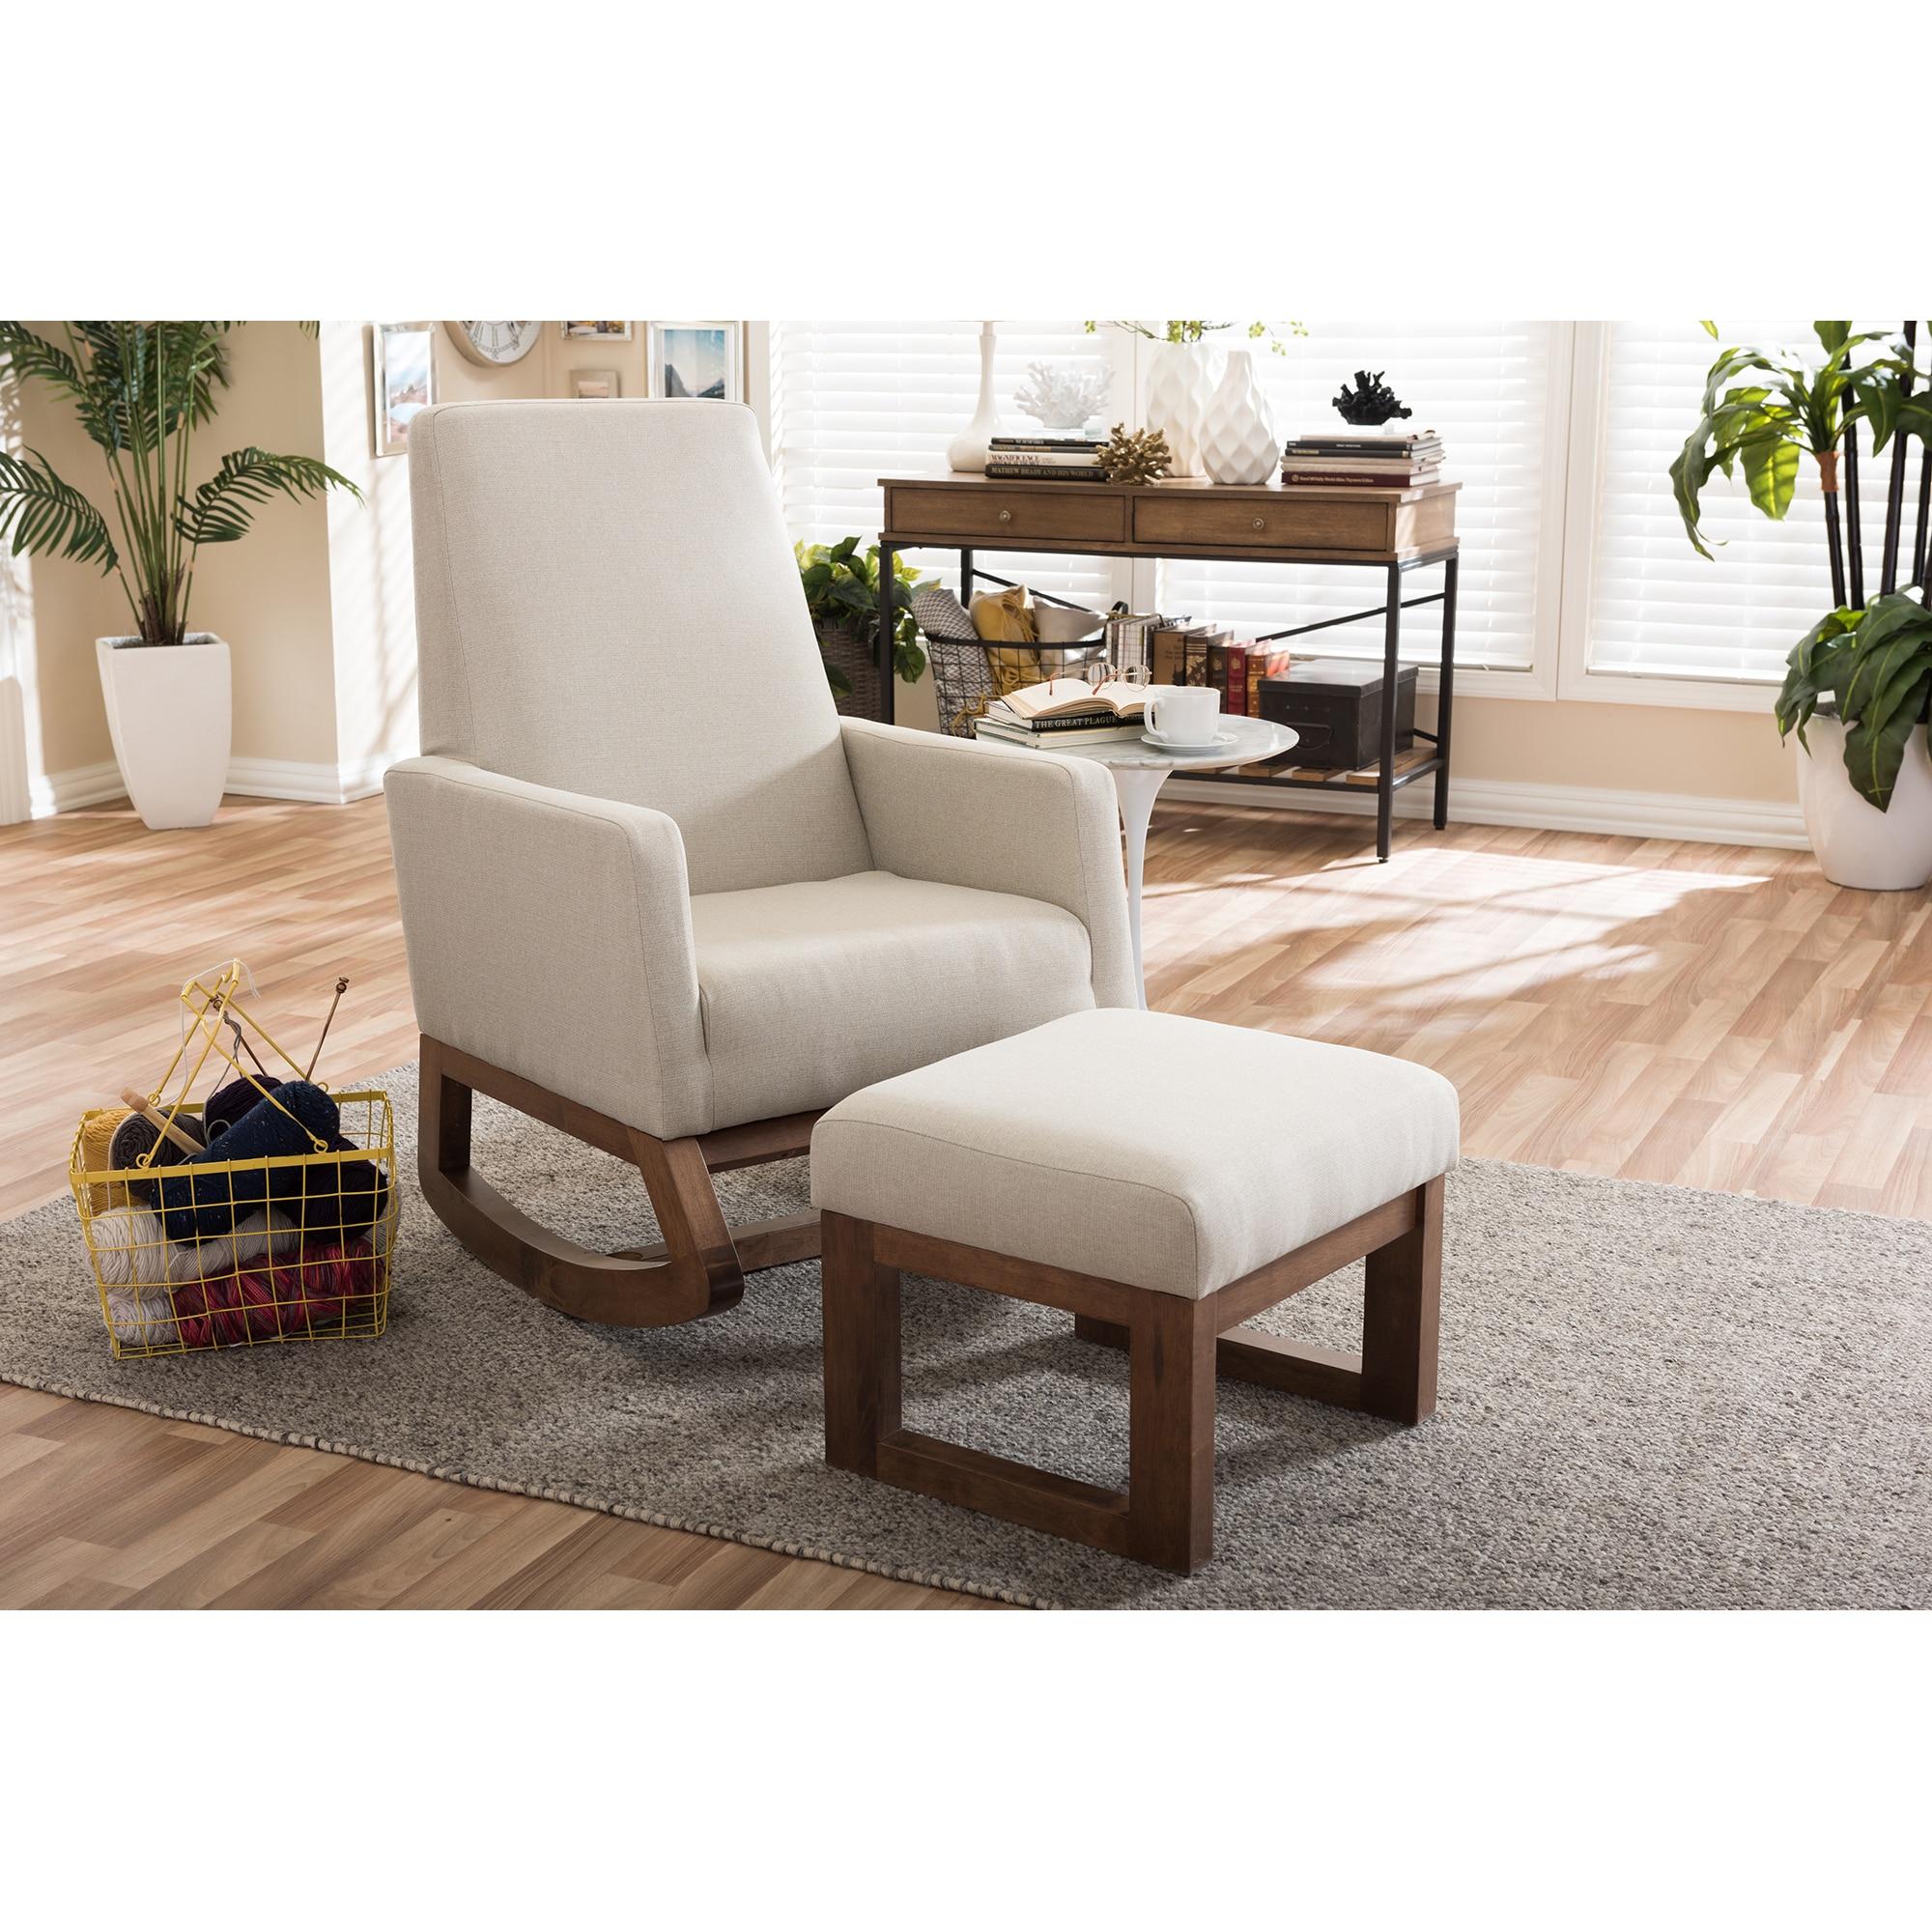 Shop baxton studio yashiya mid century retro modern light - Fabric rocking chairs living room ...